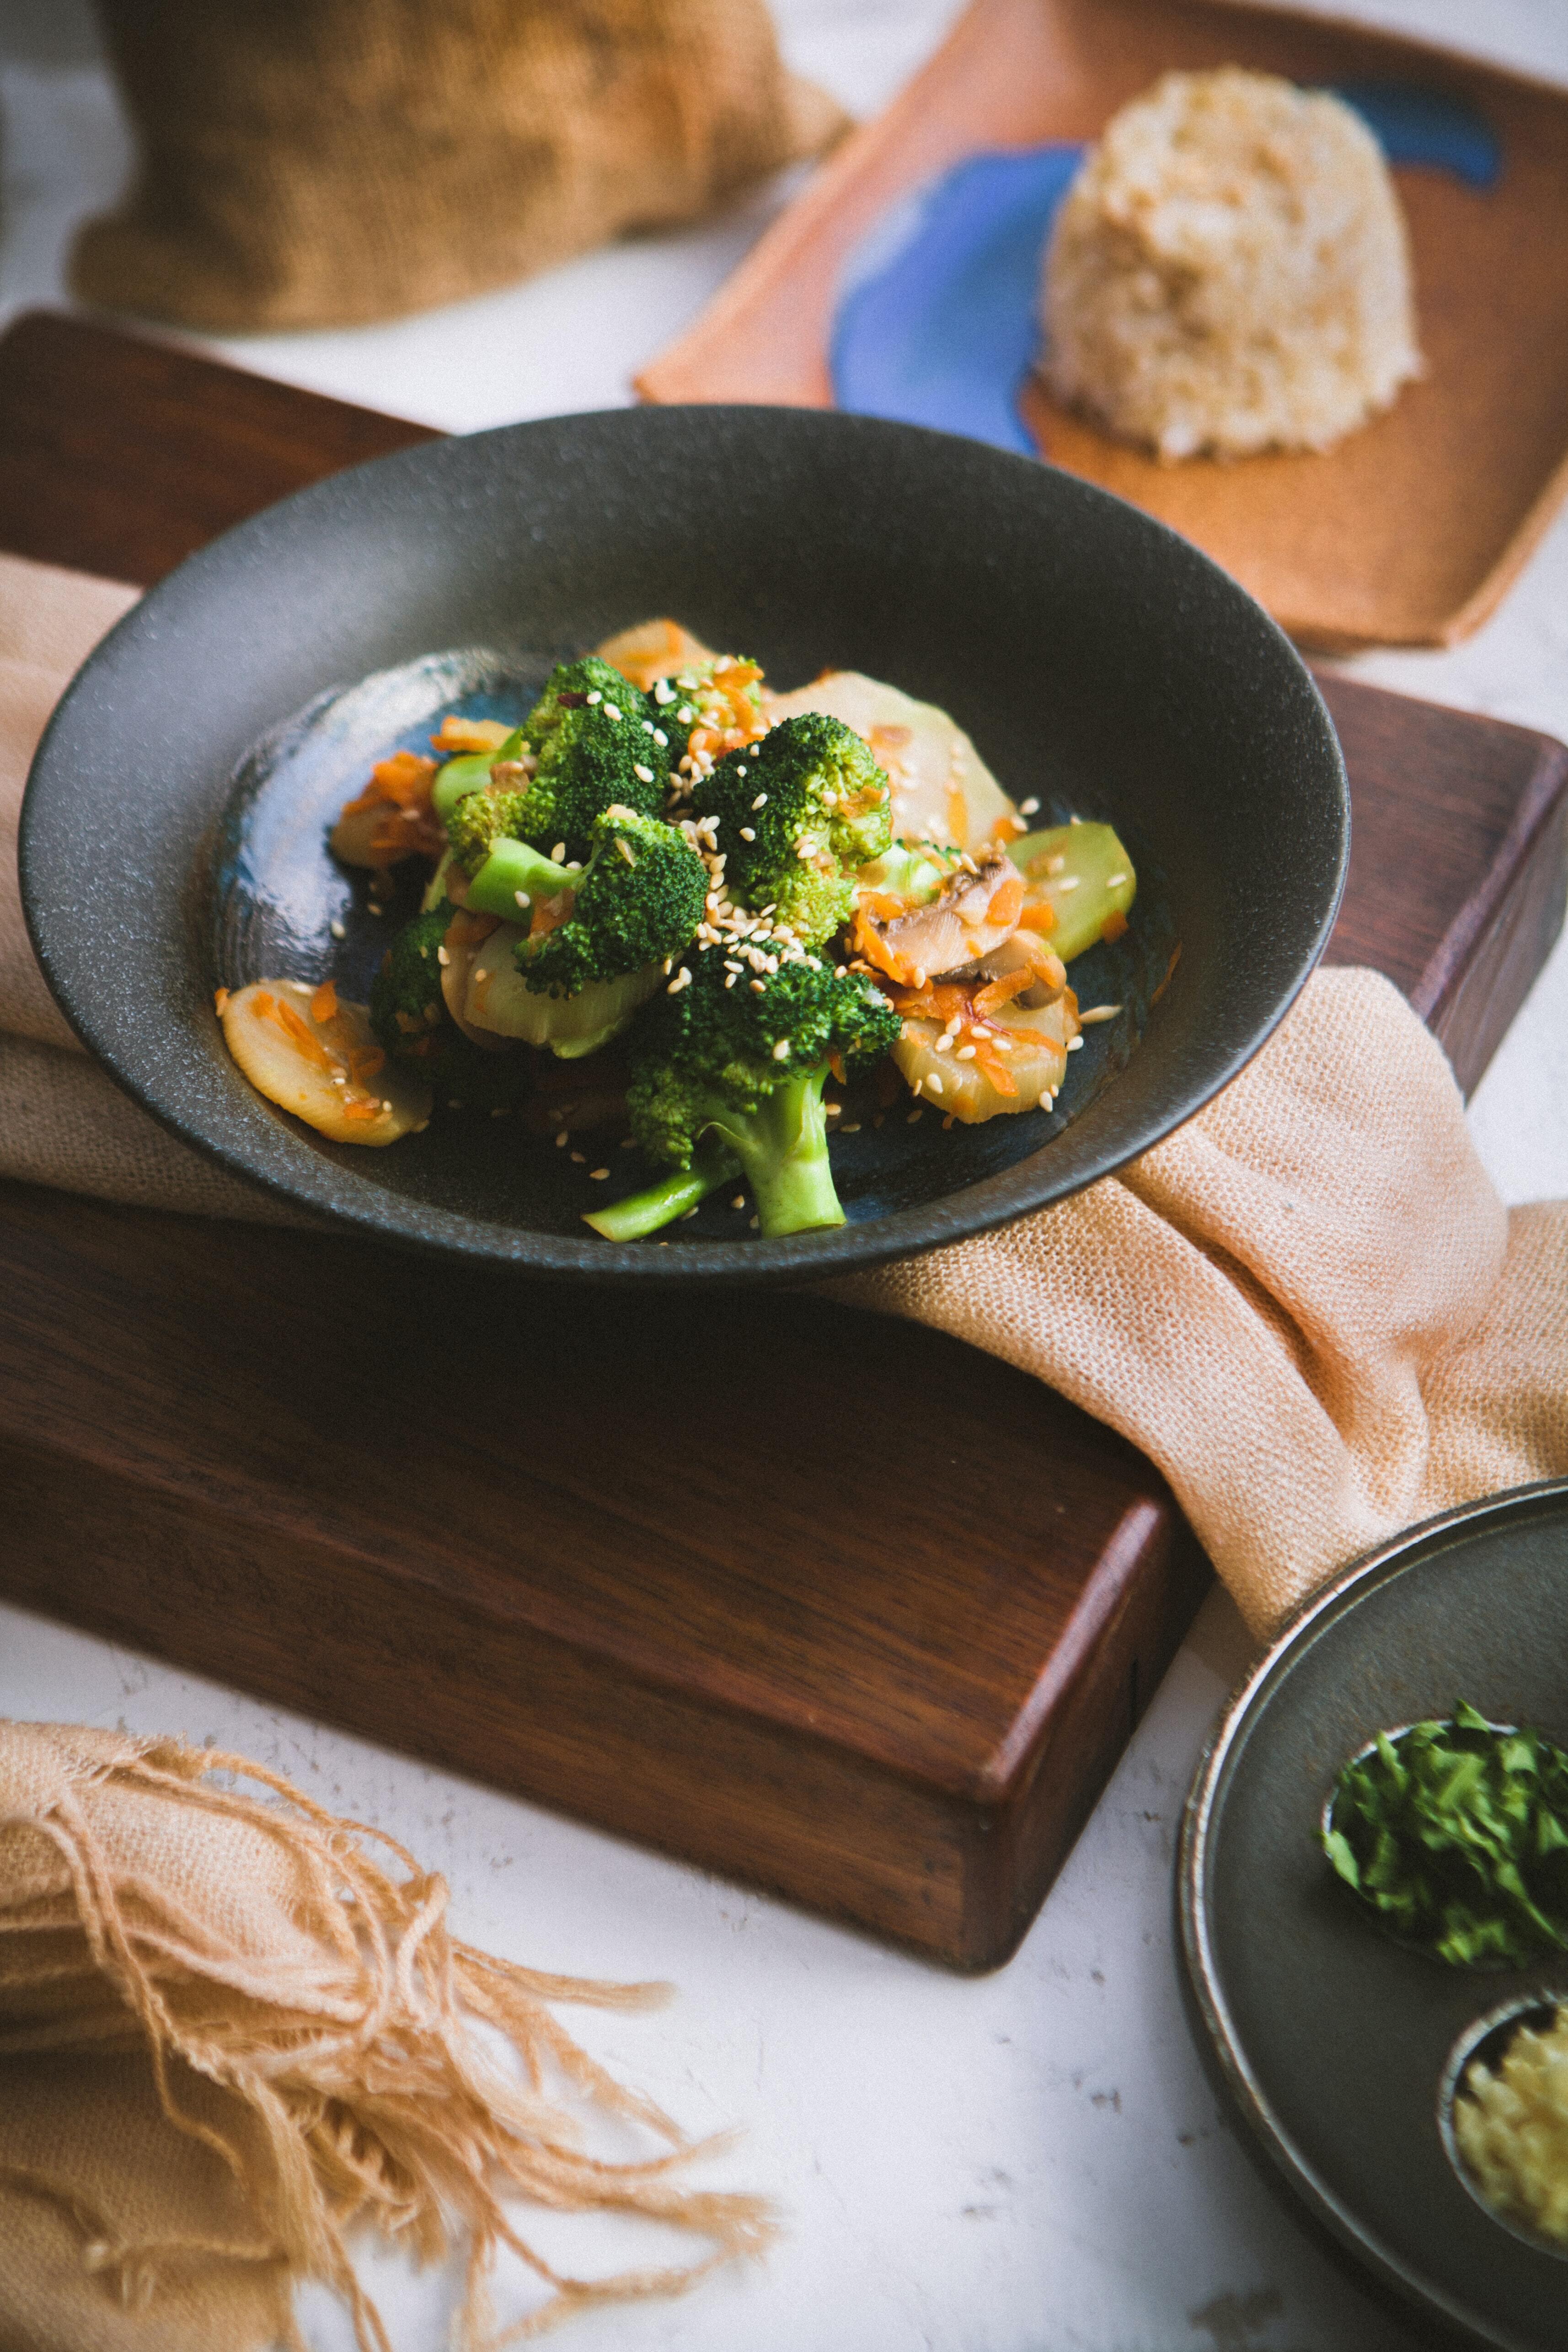 Broccoli dish, Photo by Andrei on Unsplash